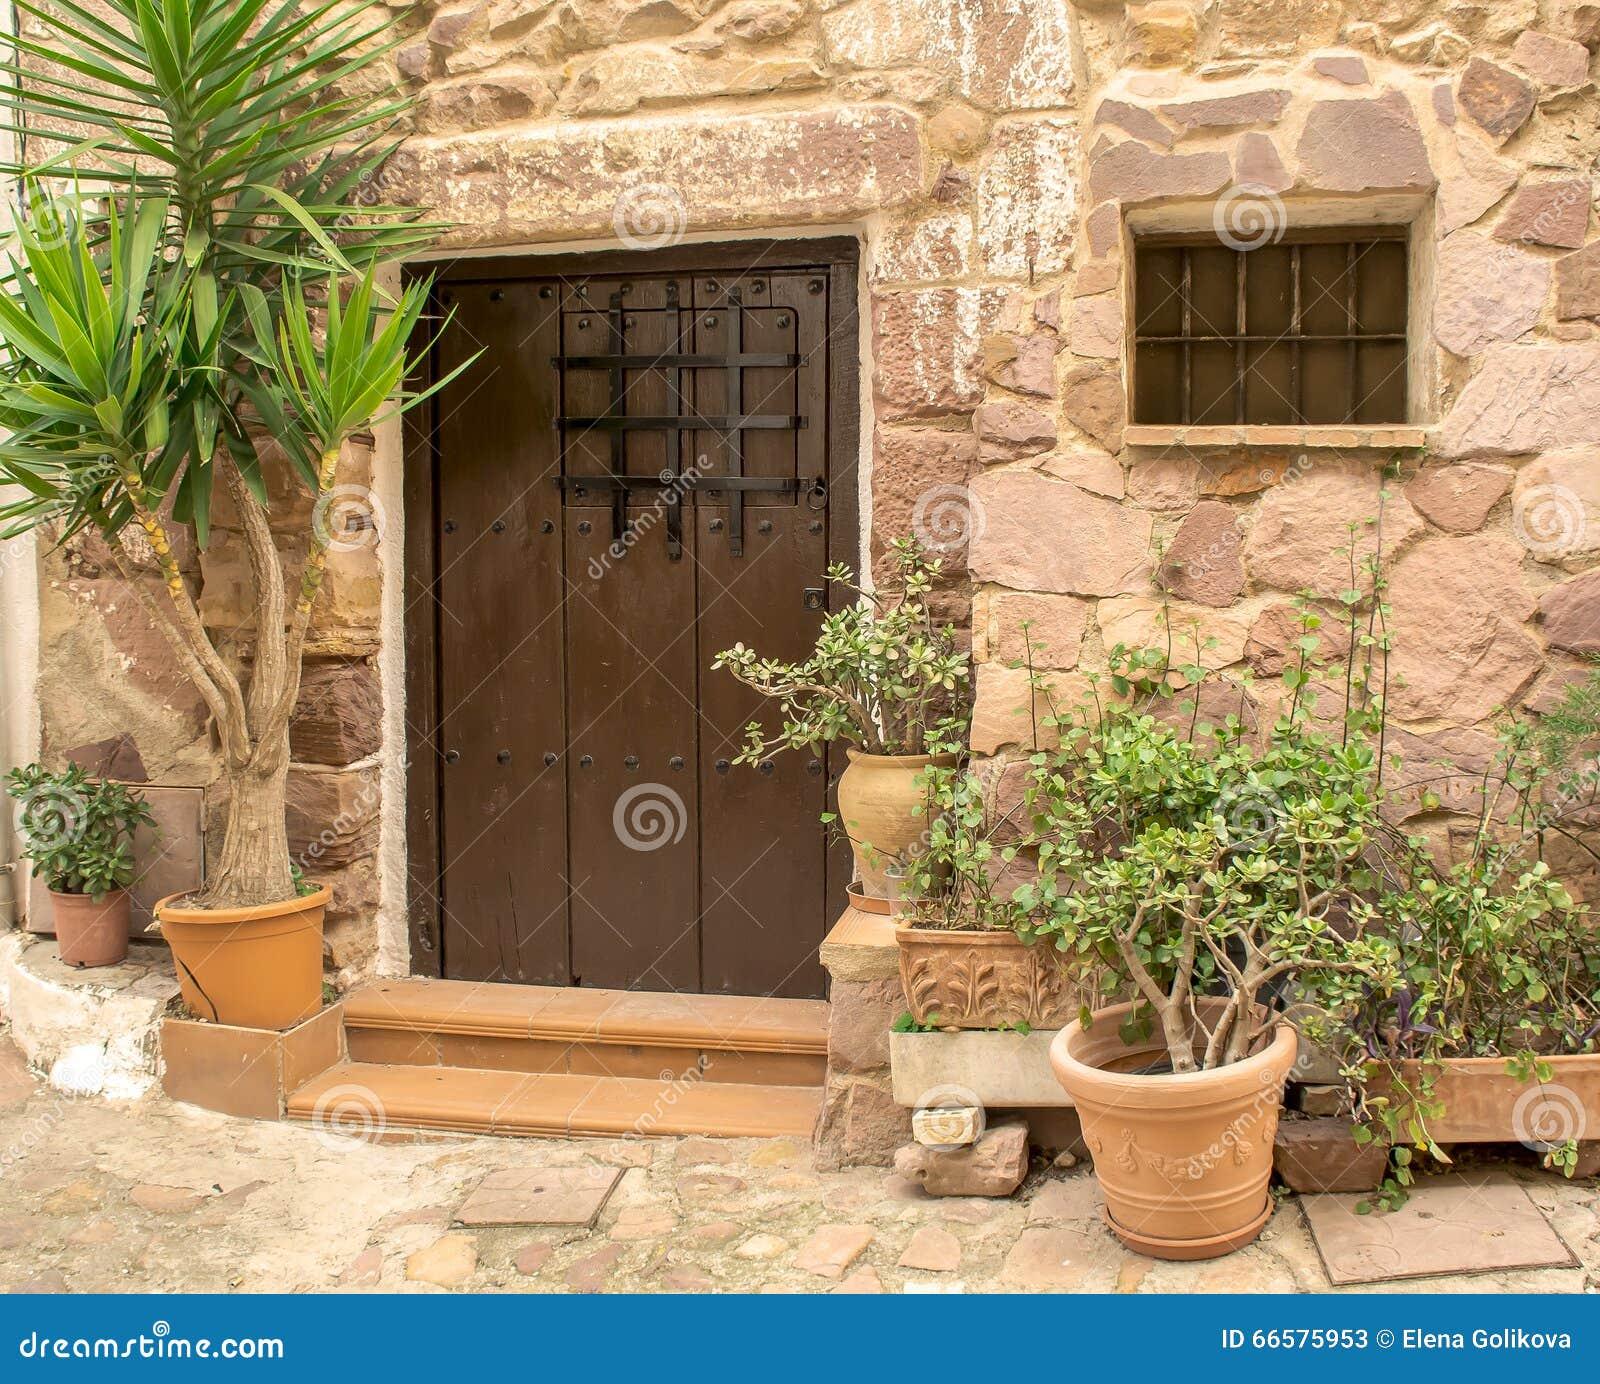 Wooden front door of old stone brick house royalty free for Door in spanish